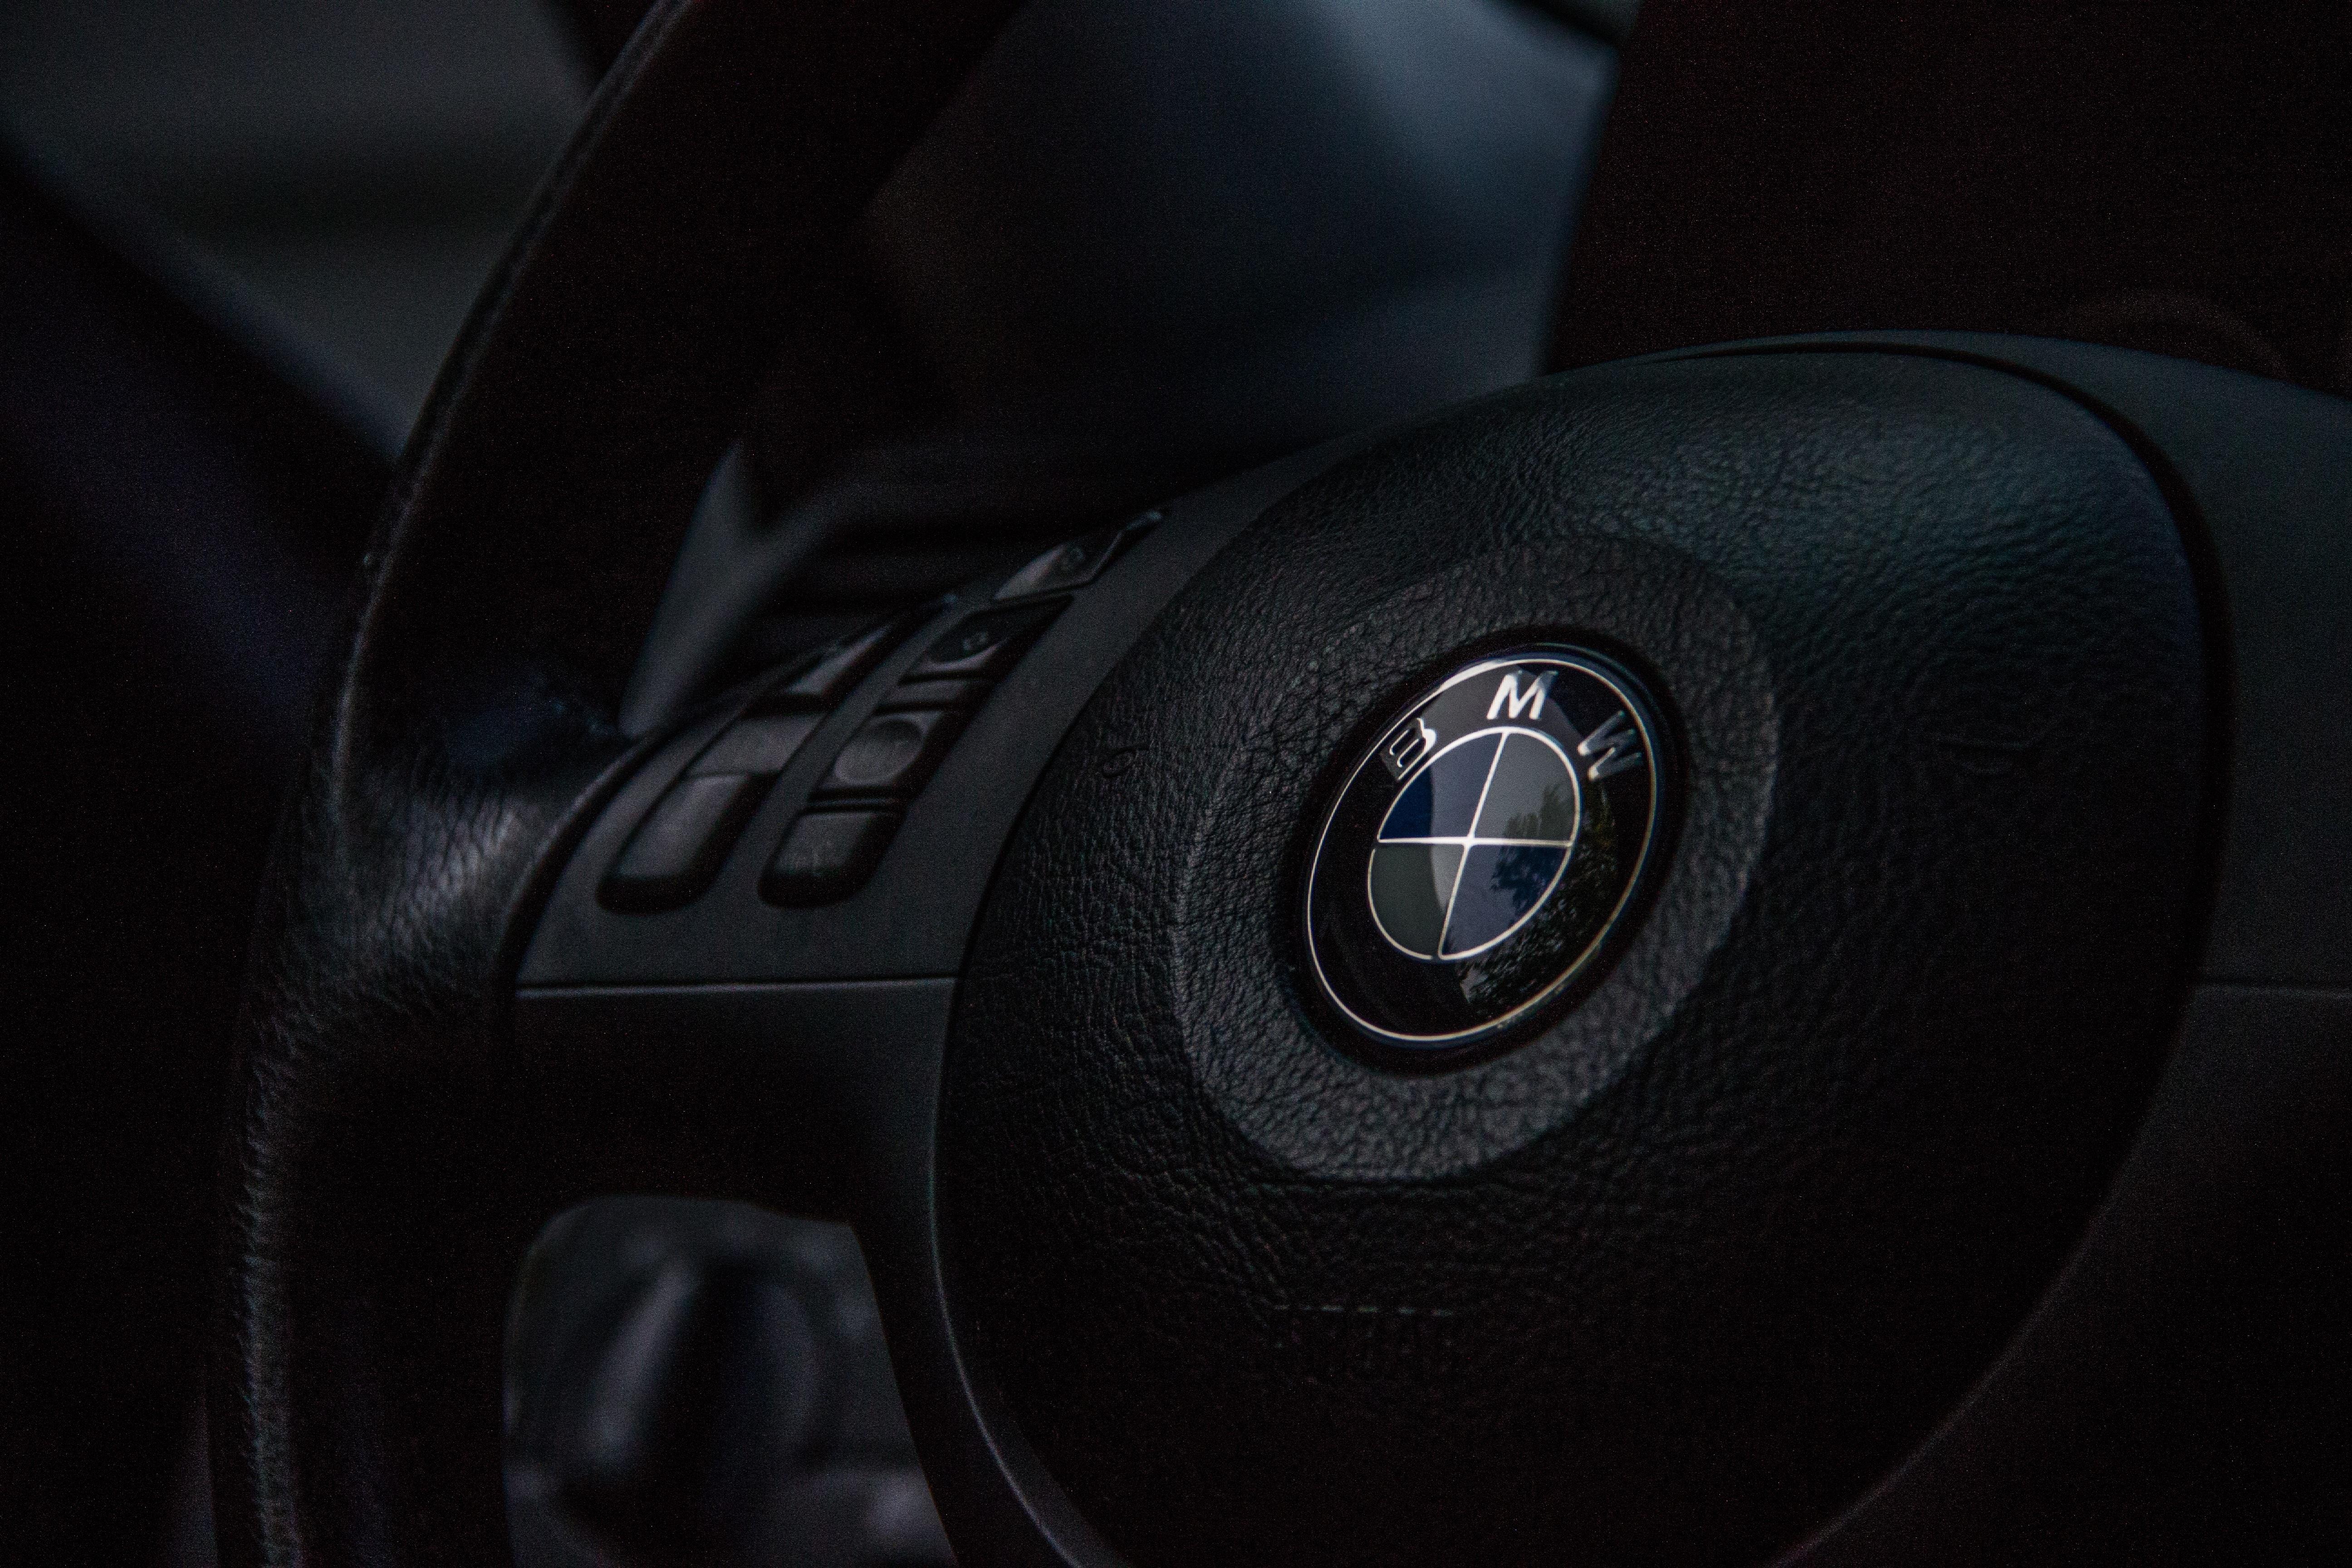 fondos de pantalla negro bmw veh237culo logo coche